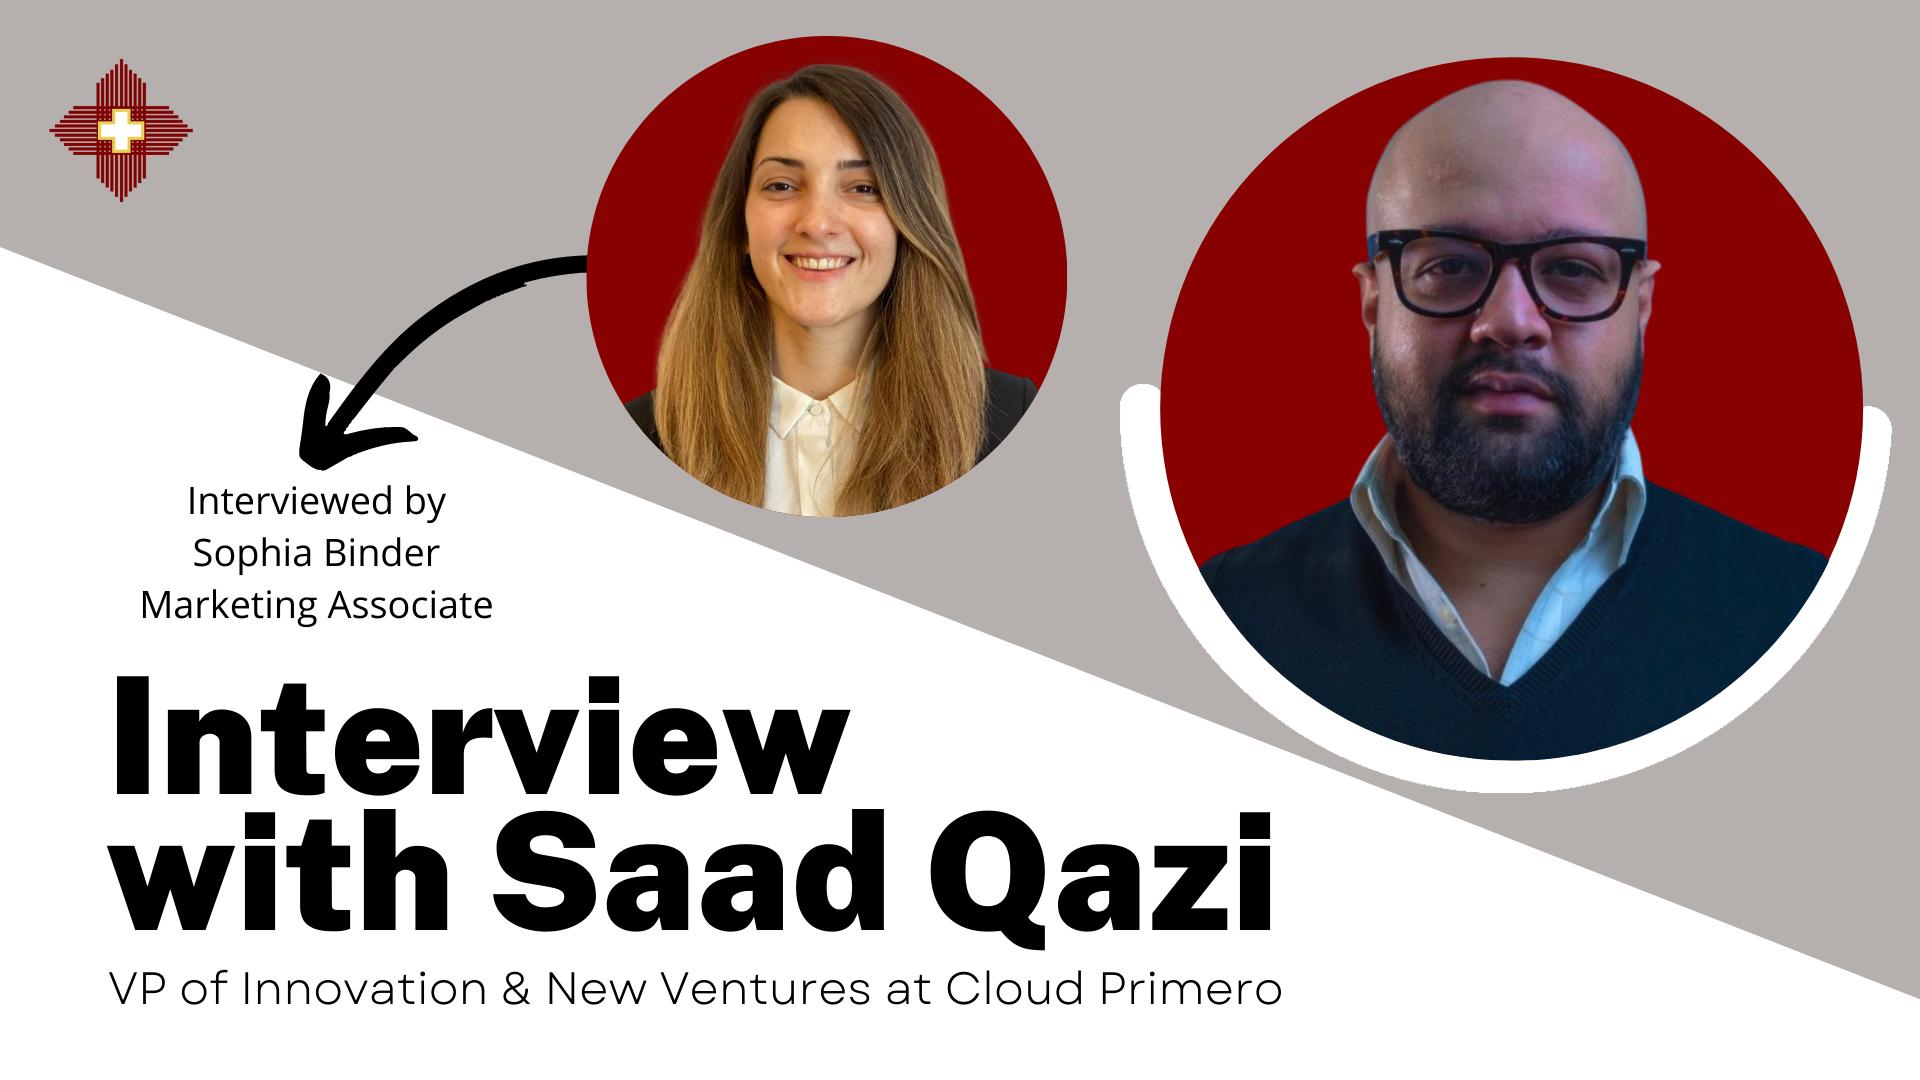 FINAL Interview with Saad Qazi, Cloud Primero